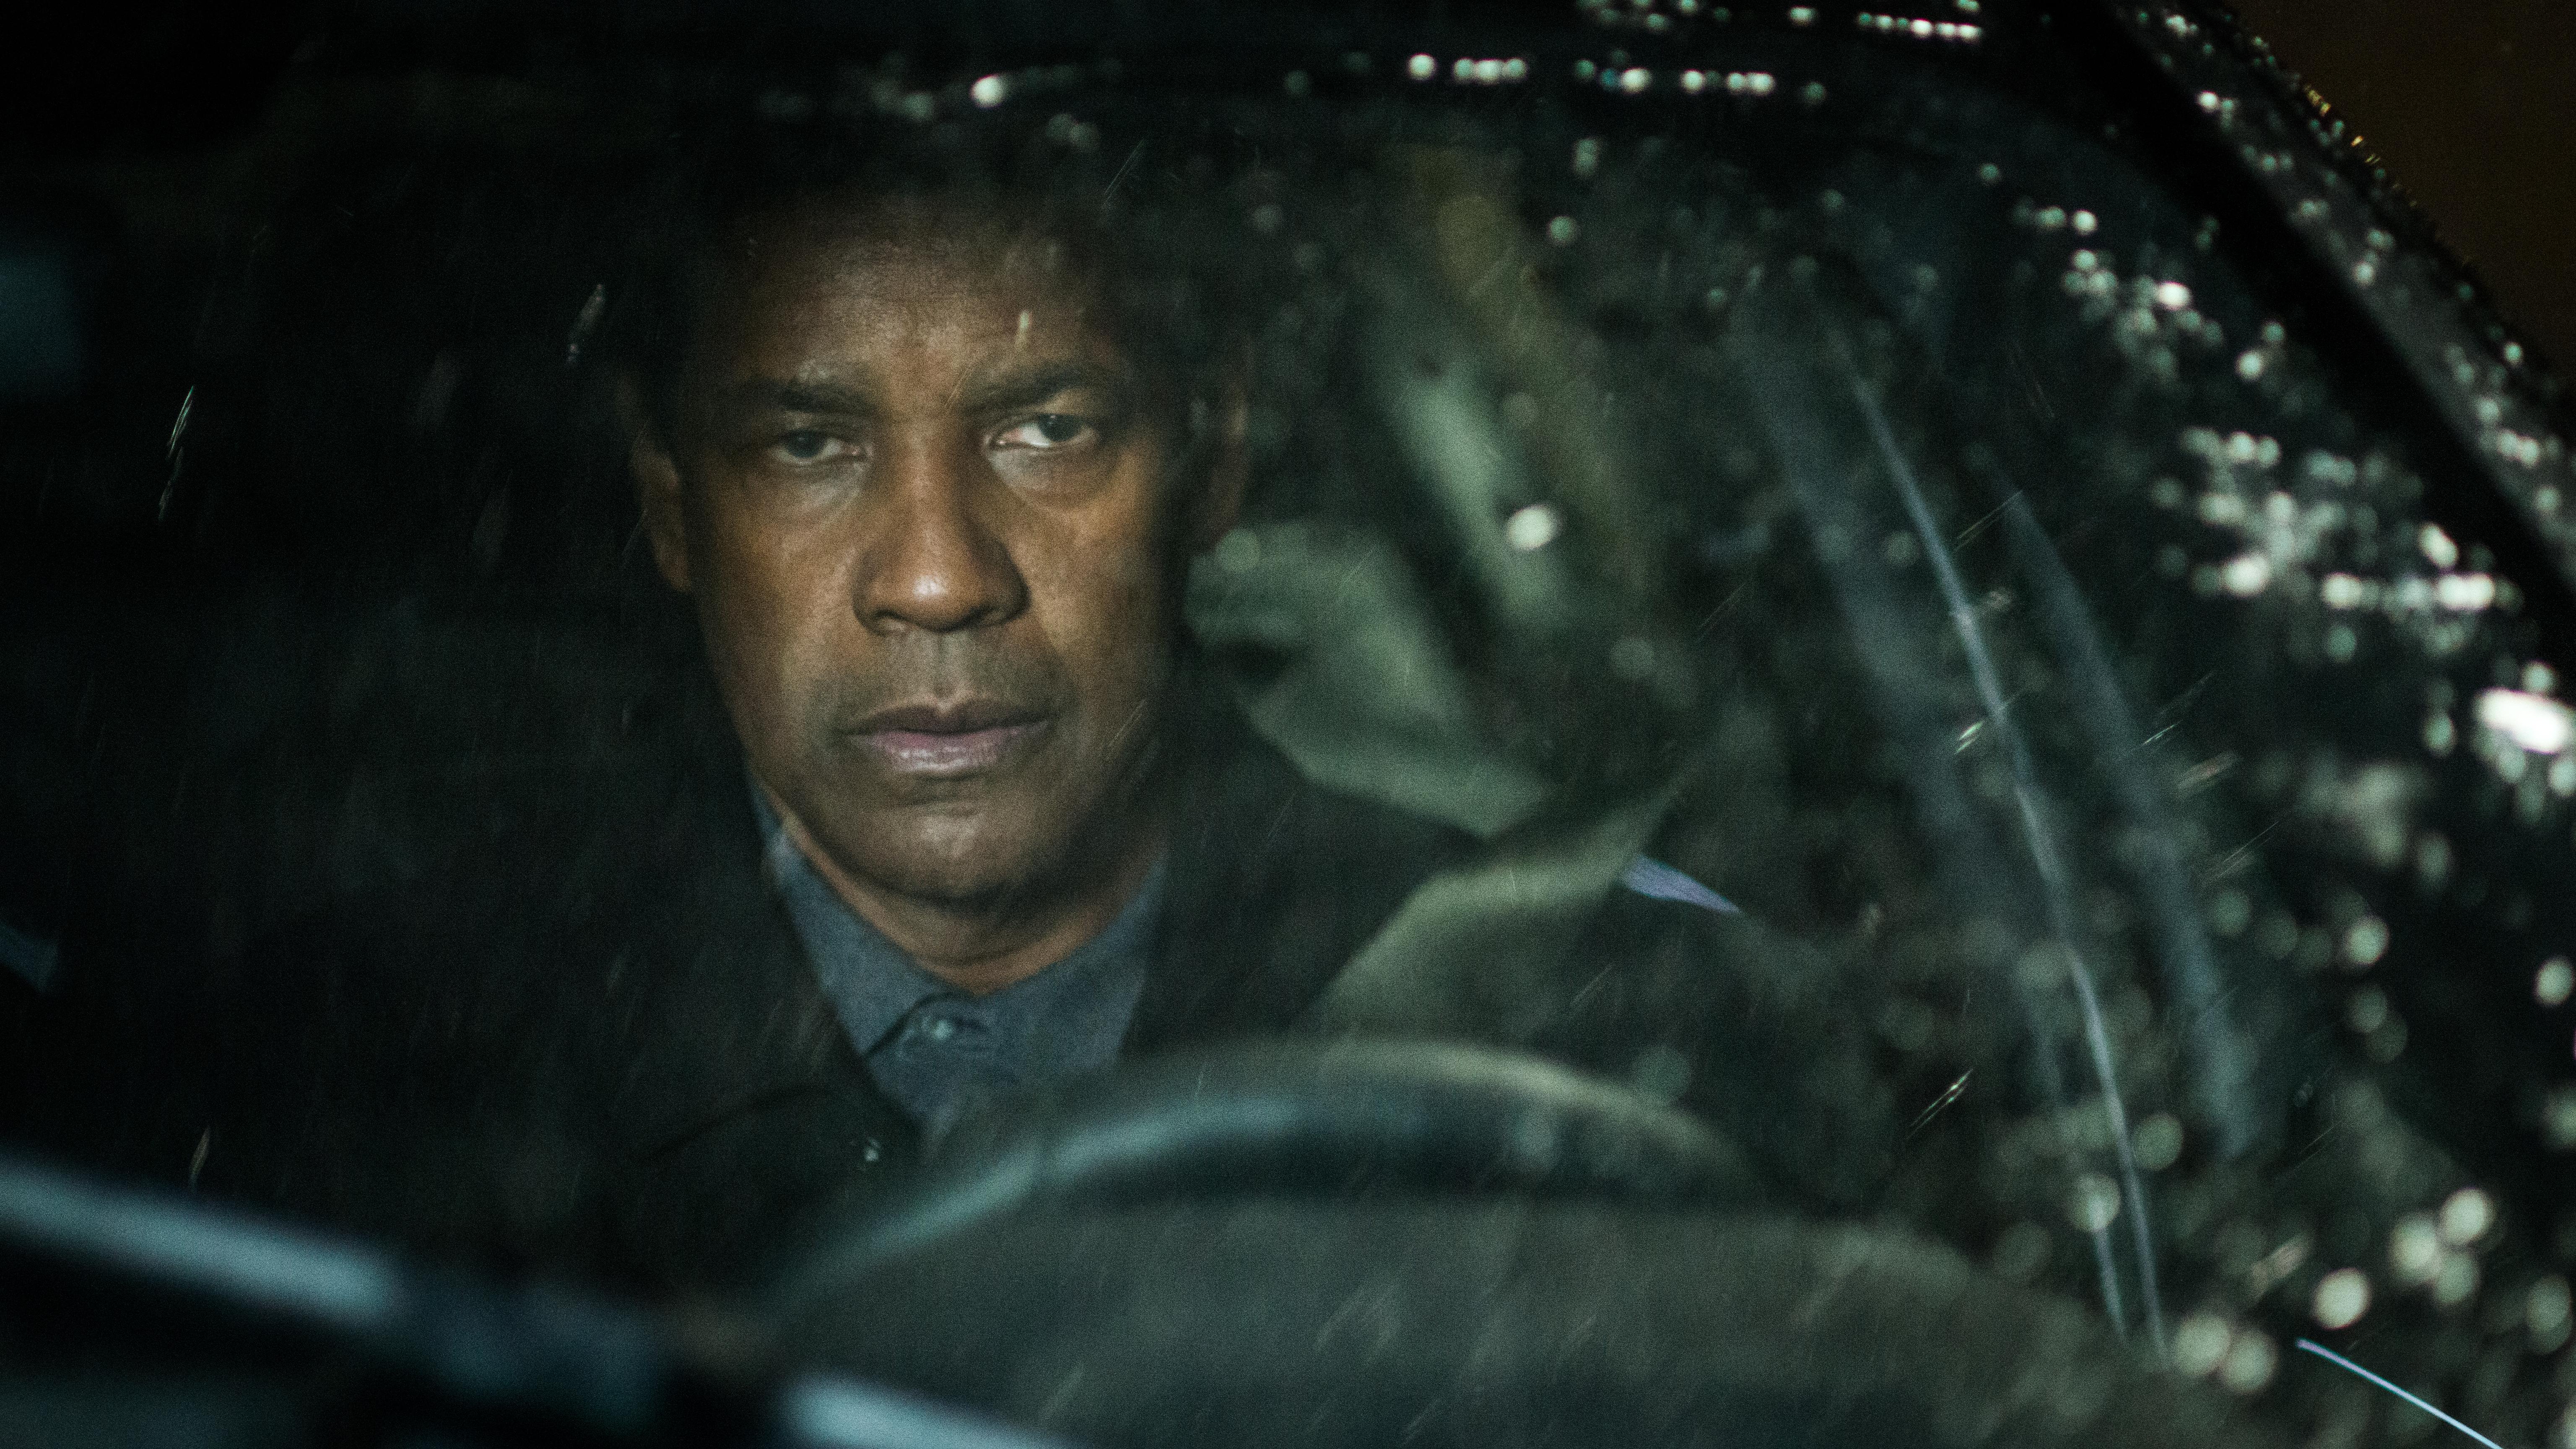 The Equalizer 2 review: Denzel Washington as a superhero should be more fun - Vox